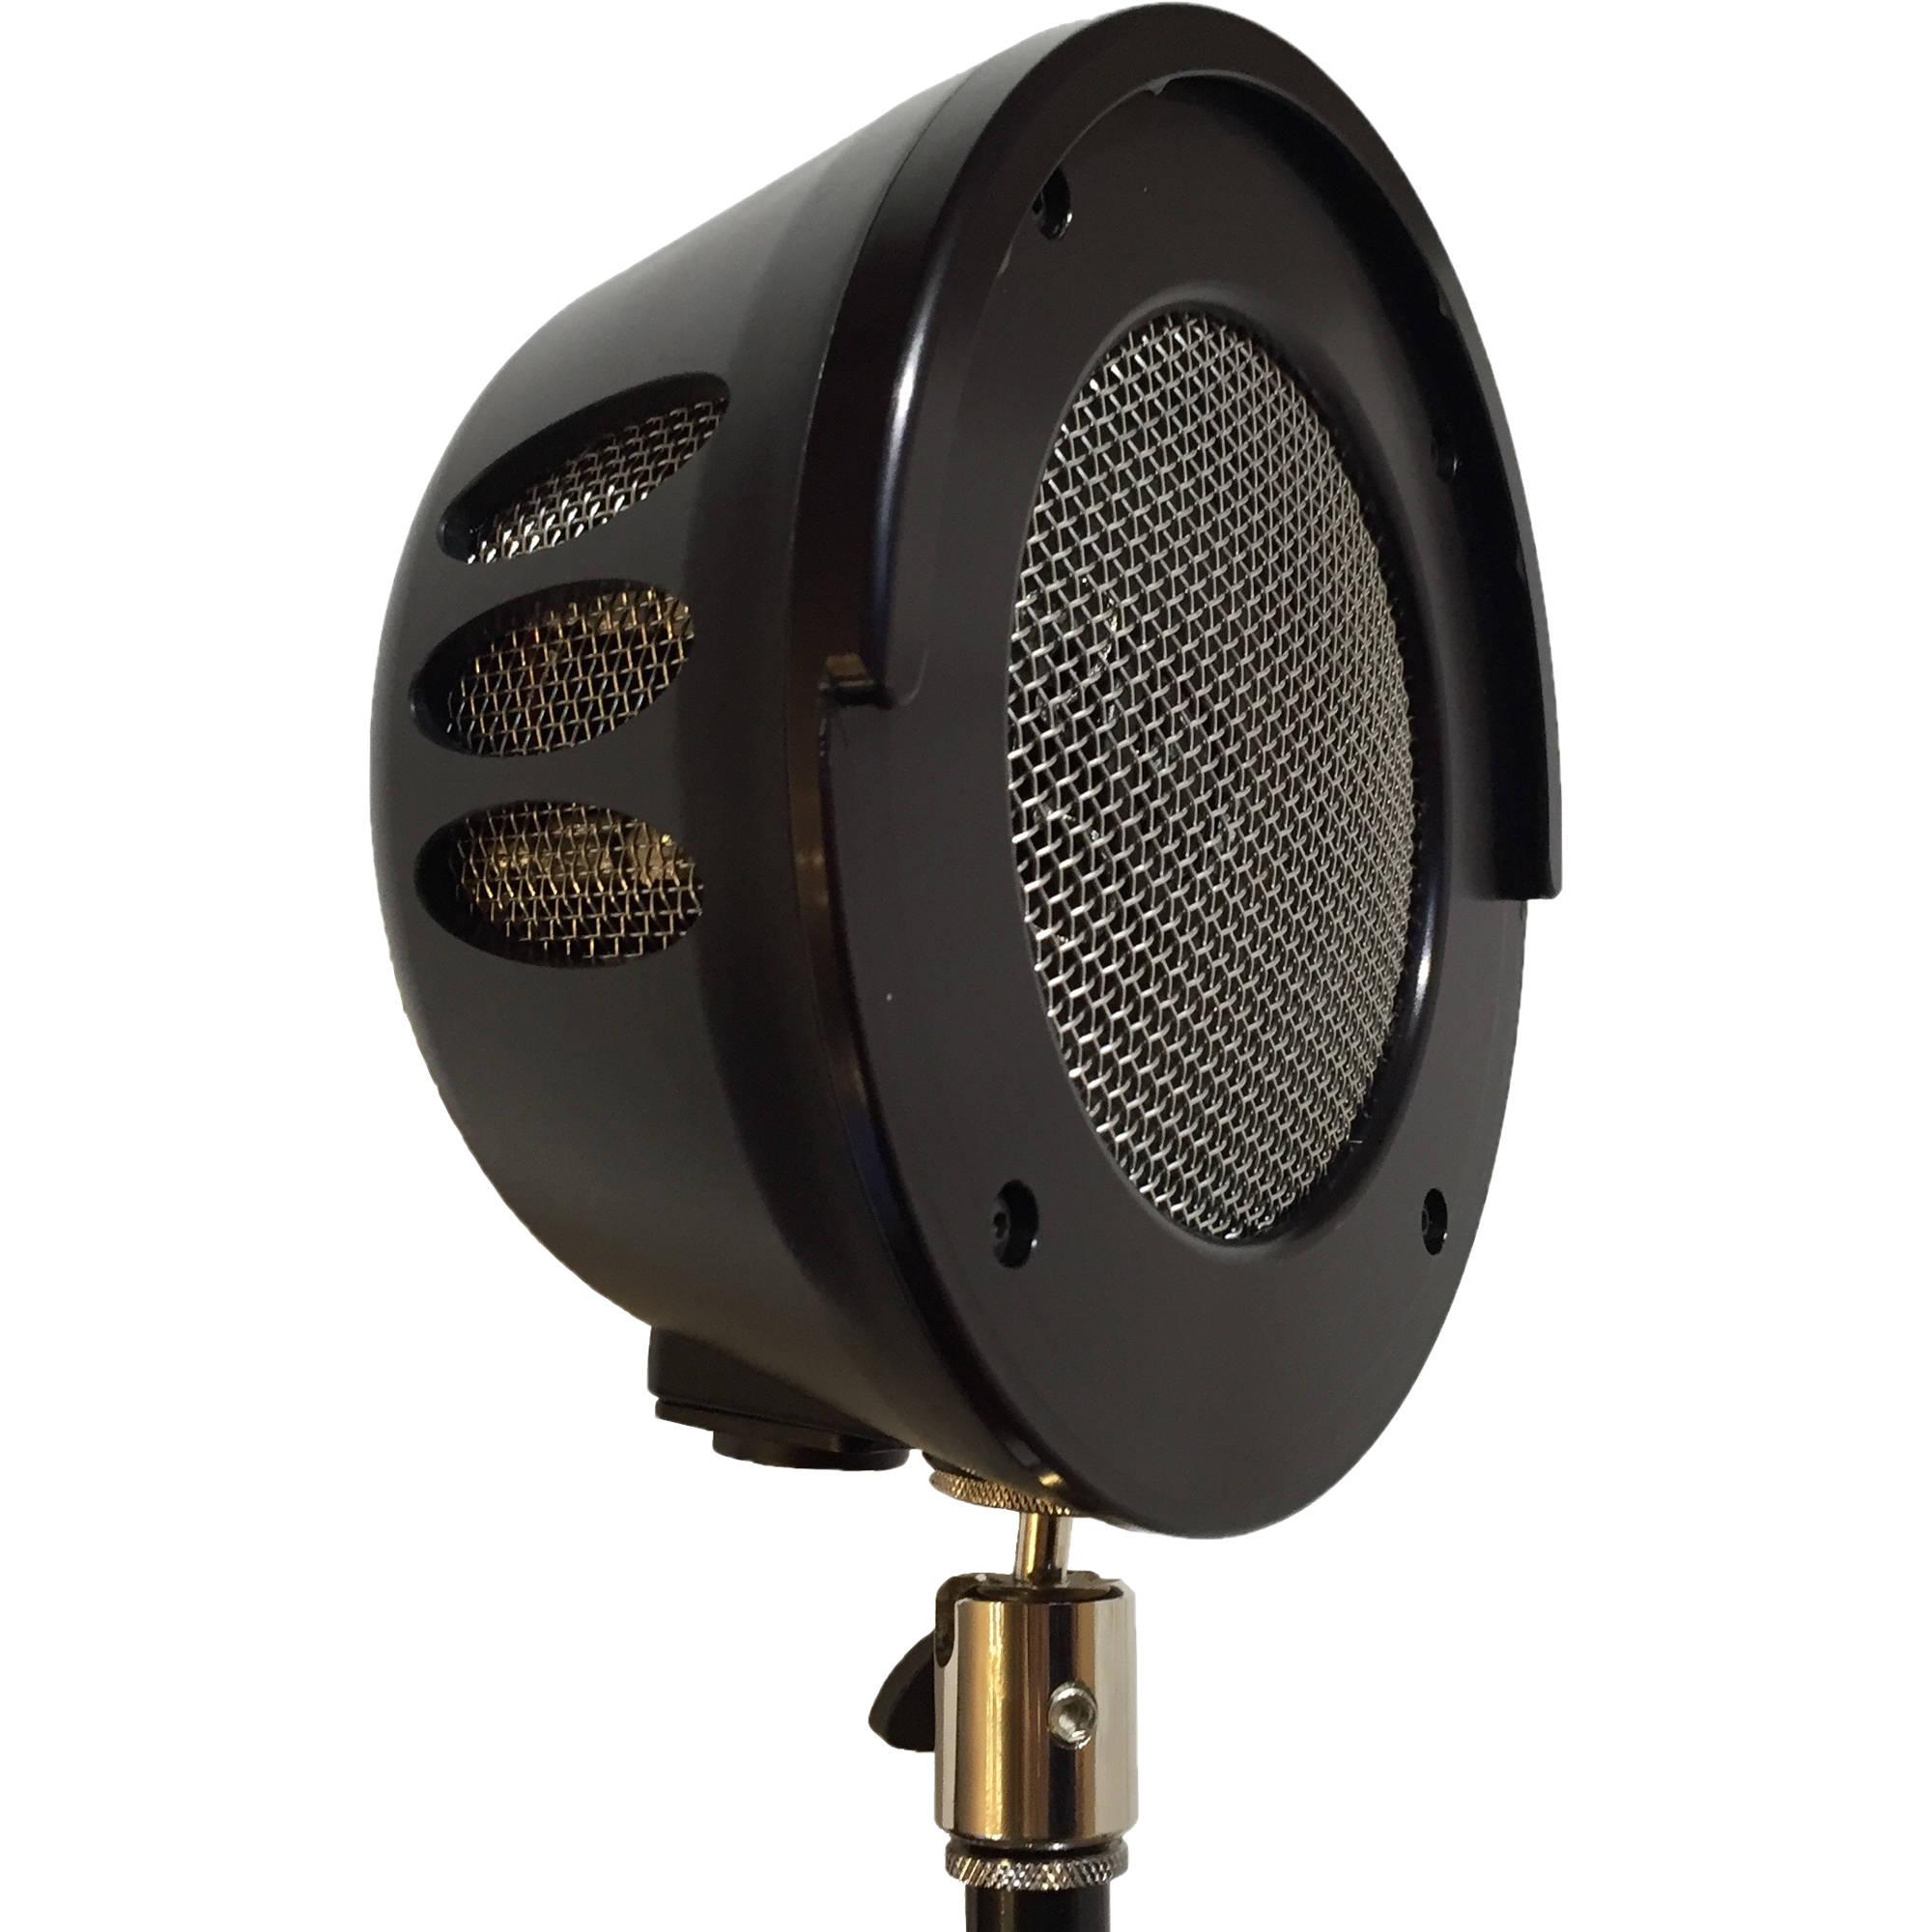 MORTON MICROPHONE SYSTEMS KickTone Dynamic Bass Drum MMS-KTN-1